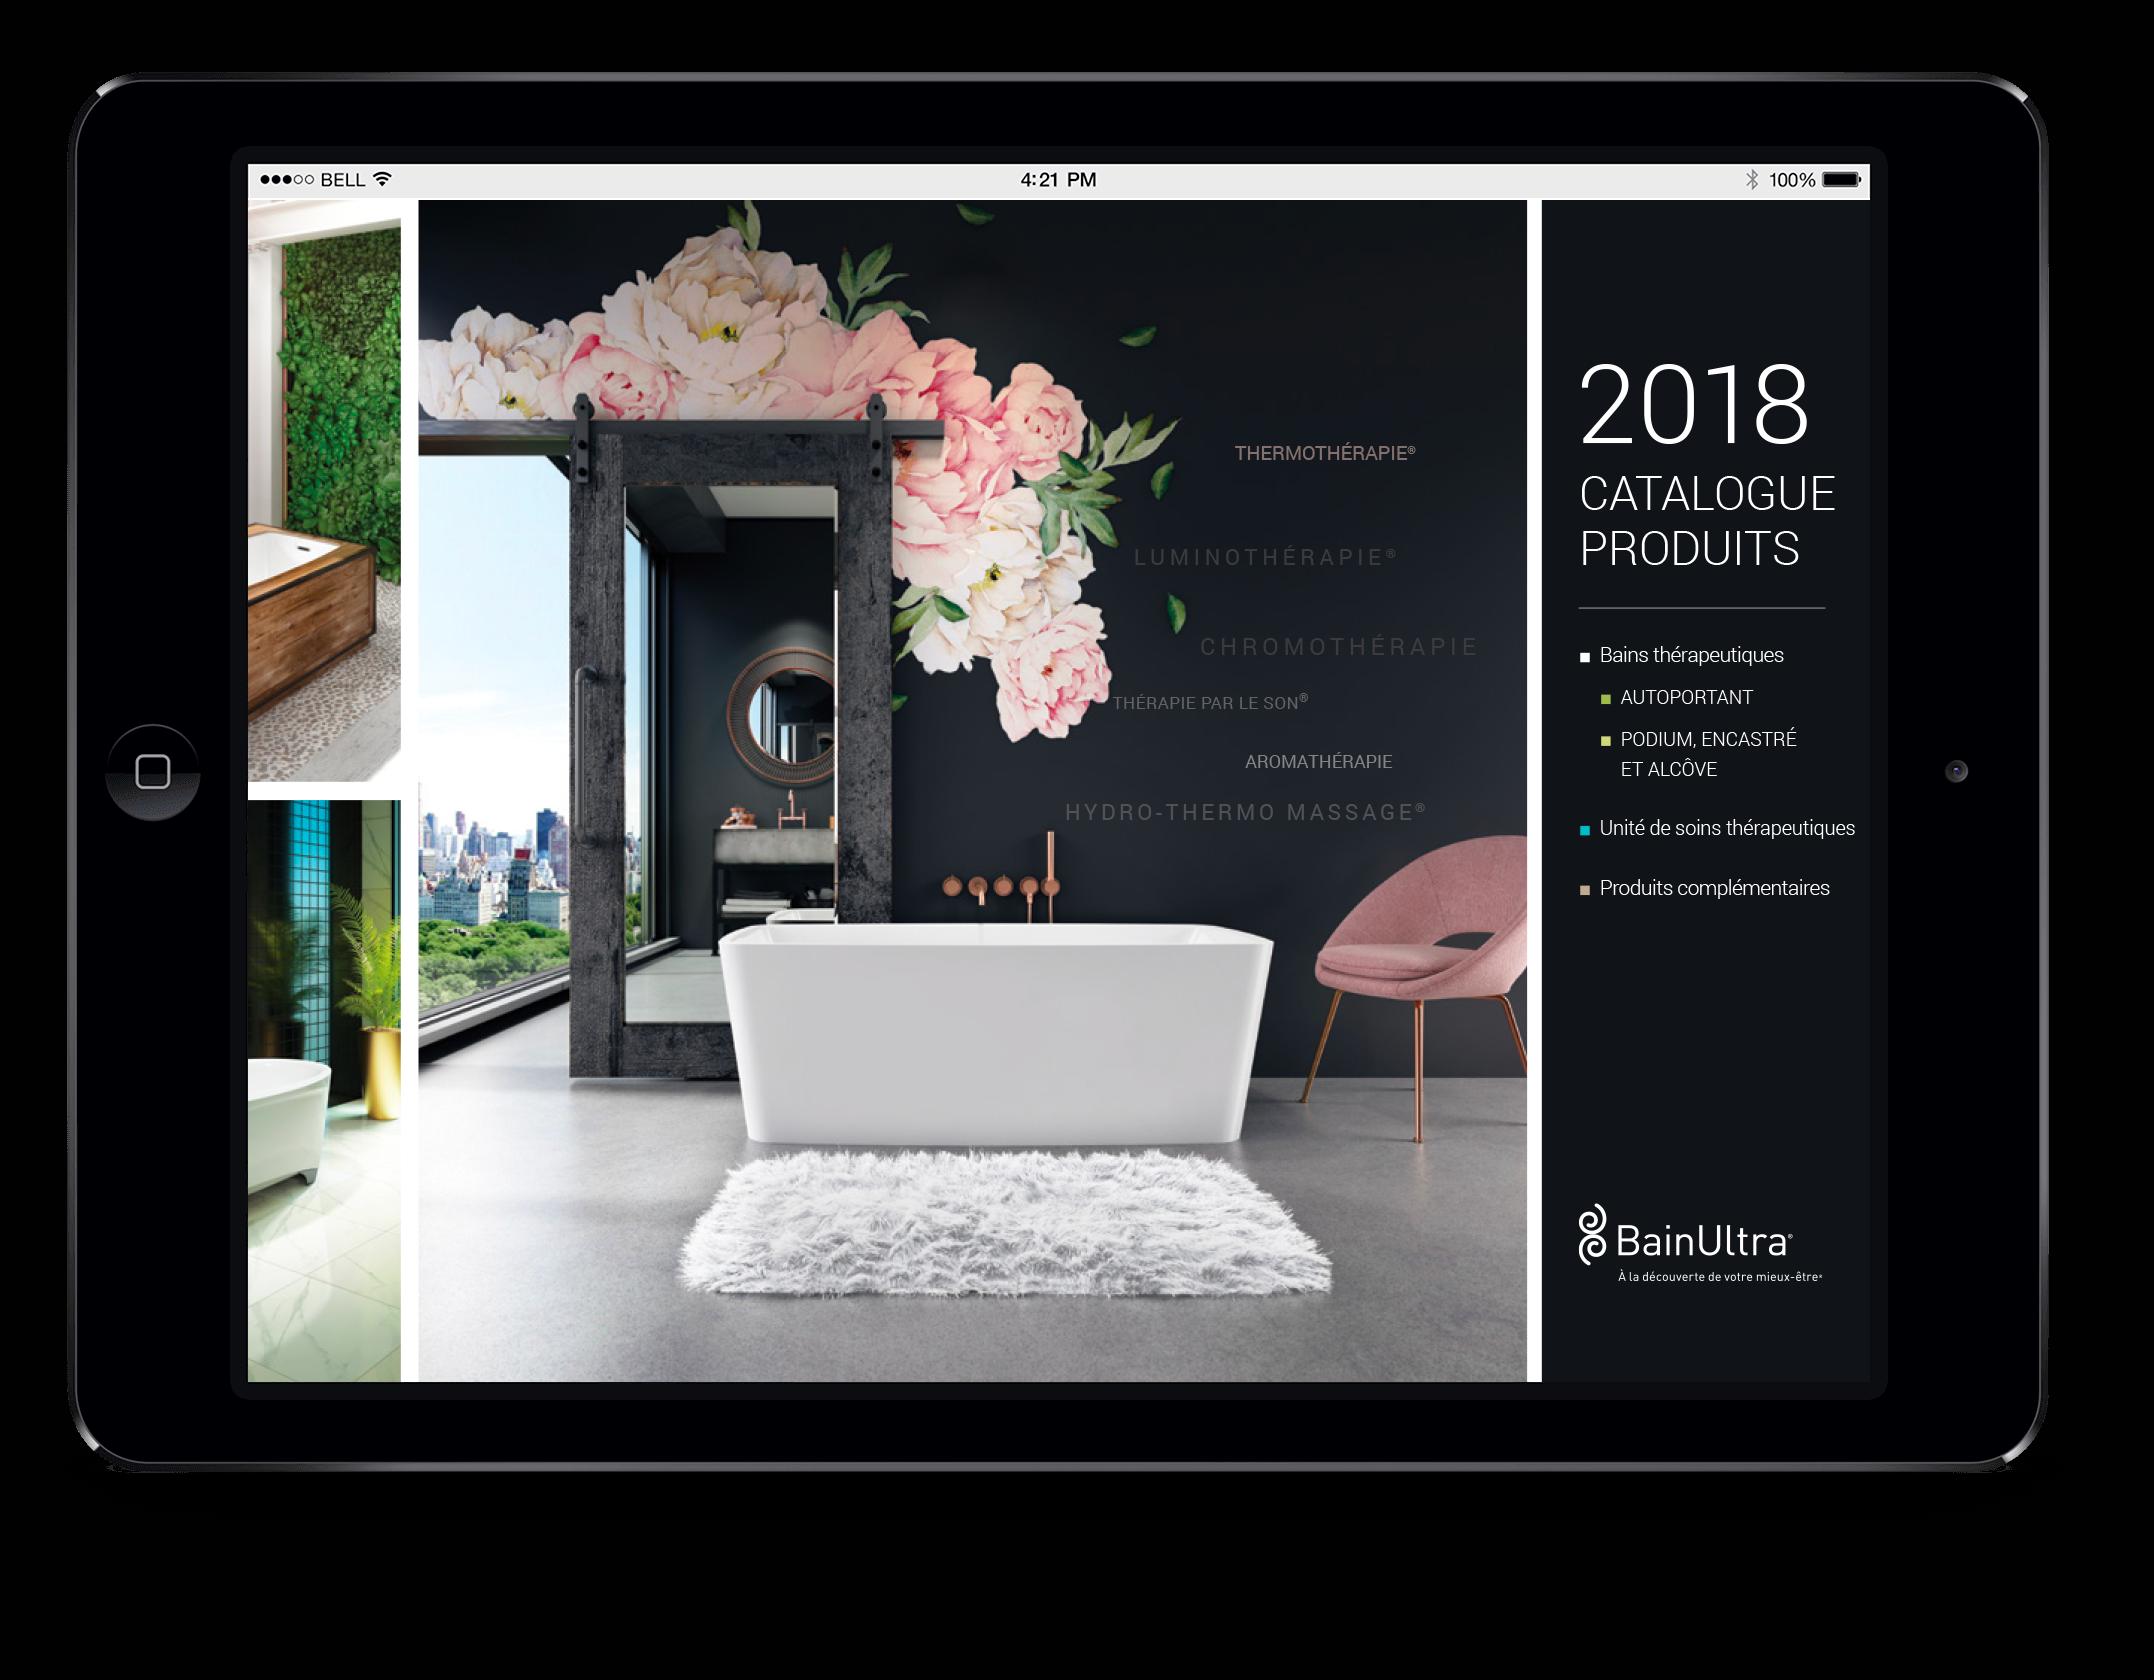 Catalogue de produits 2018